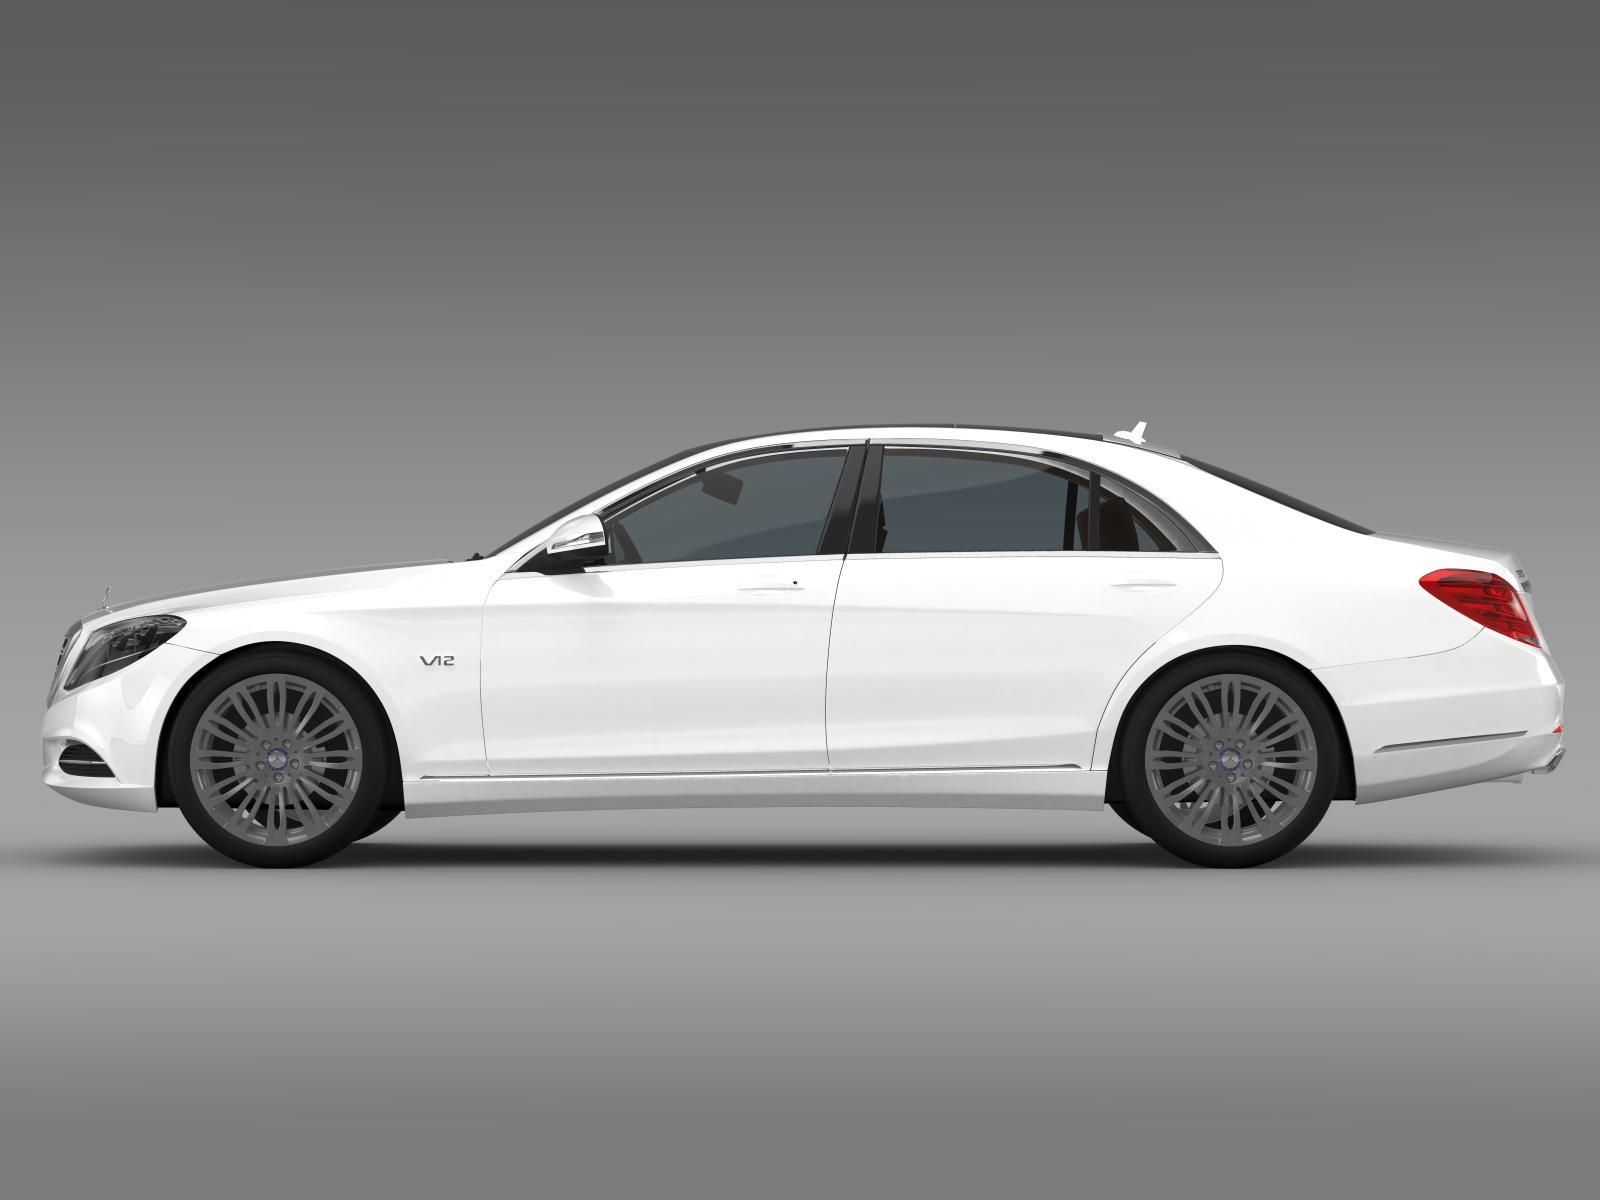 Mercedes benz s 600 v12 w222 2014 3d model for Mercedes benz s models